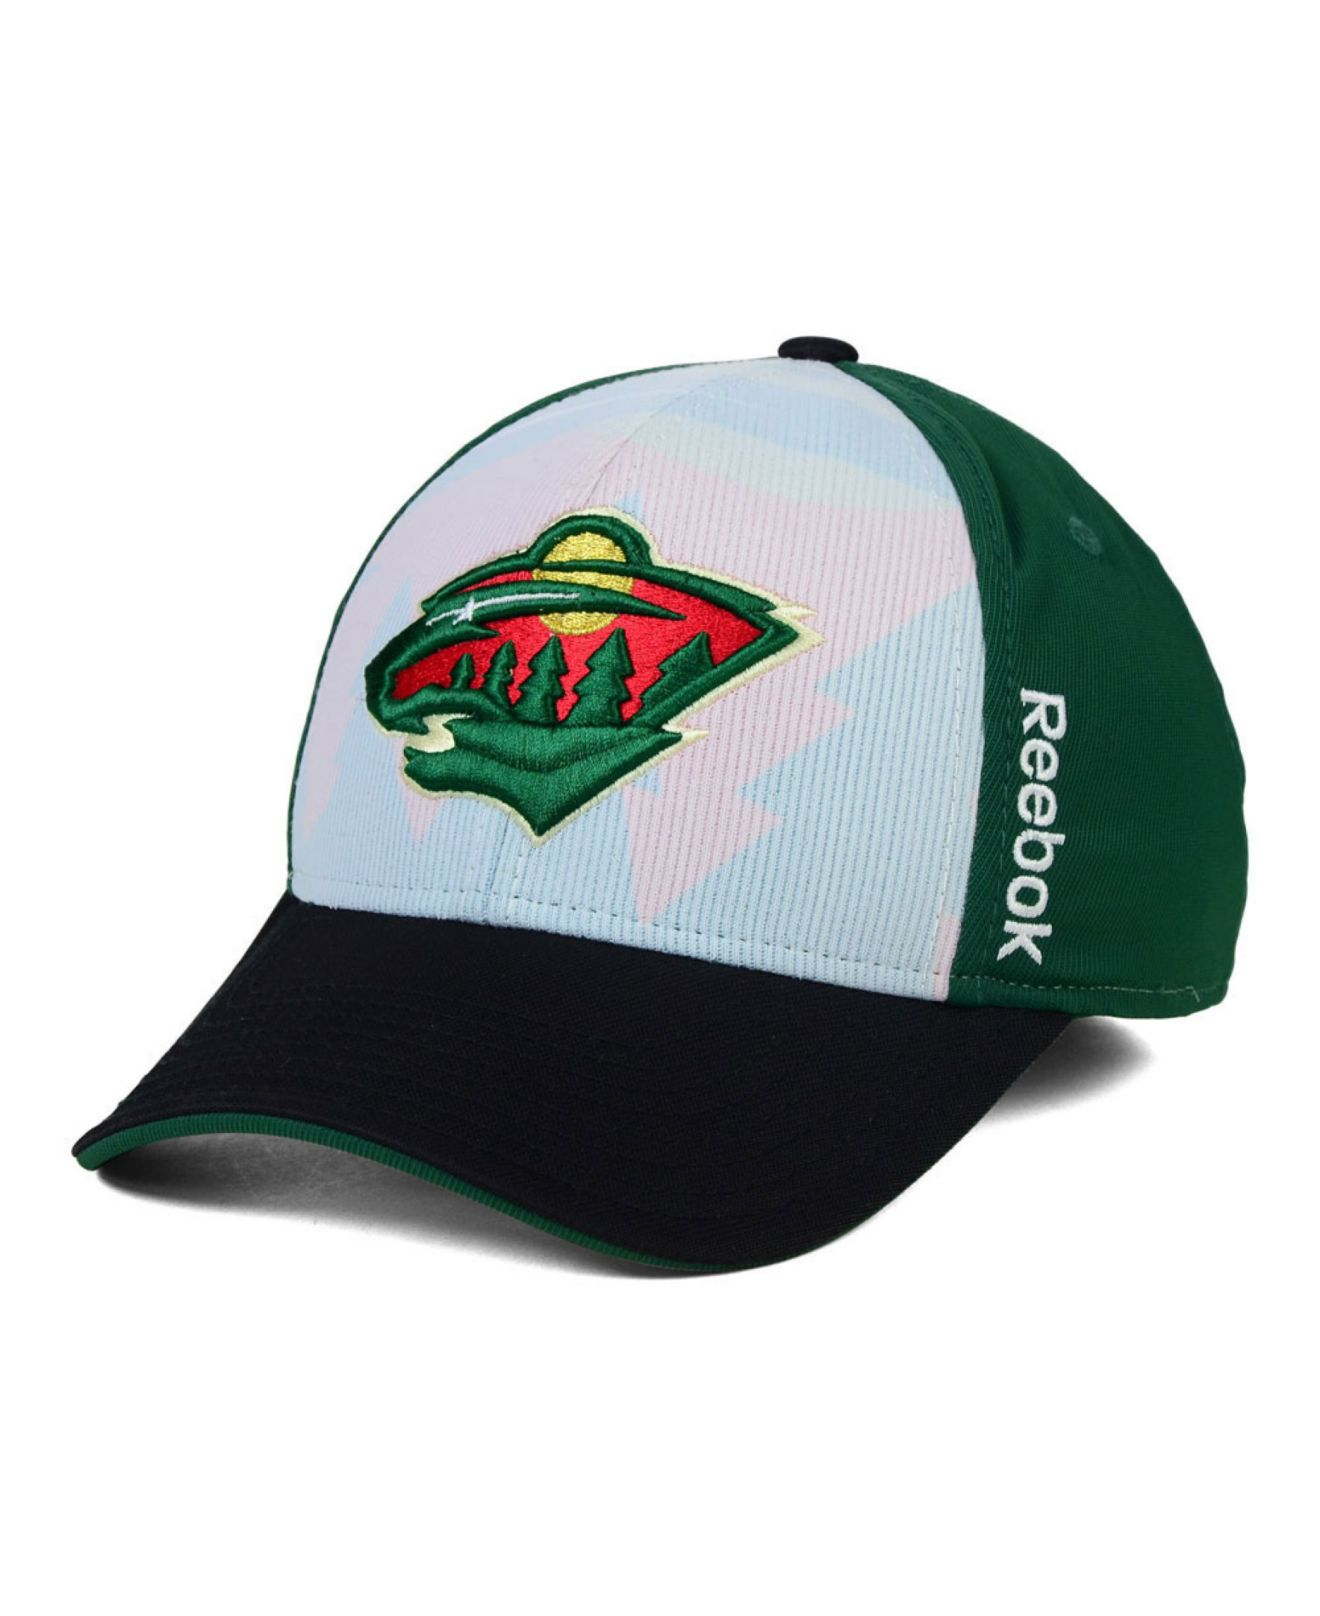 new style cd4d0 fb2fa ... amazon lyst reebok minnesota wild stretch fit cap in green for men  e2bc8 8e38e store philadelphia union adidas ...